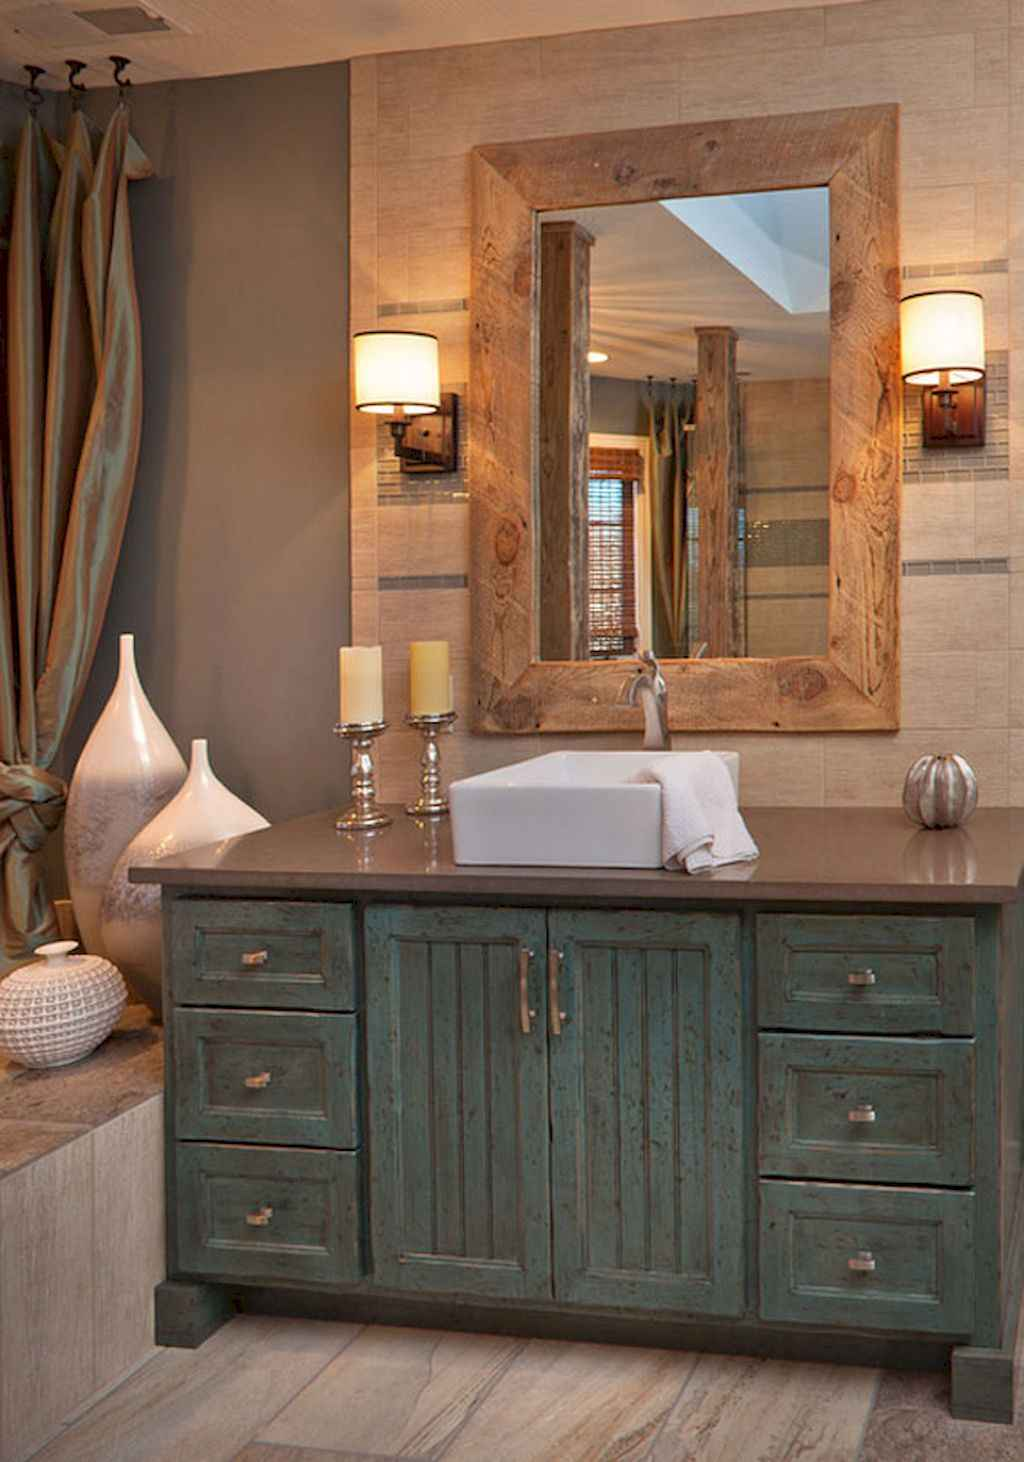 Inspiring rustic bathroom decor ideas (22)